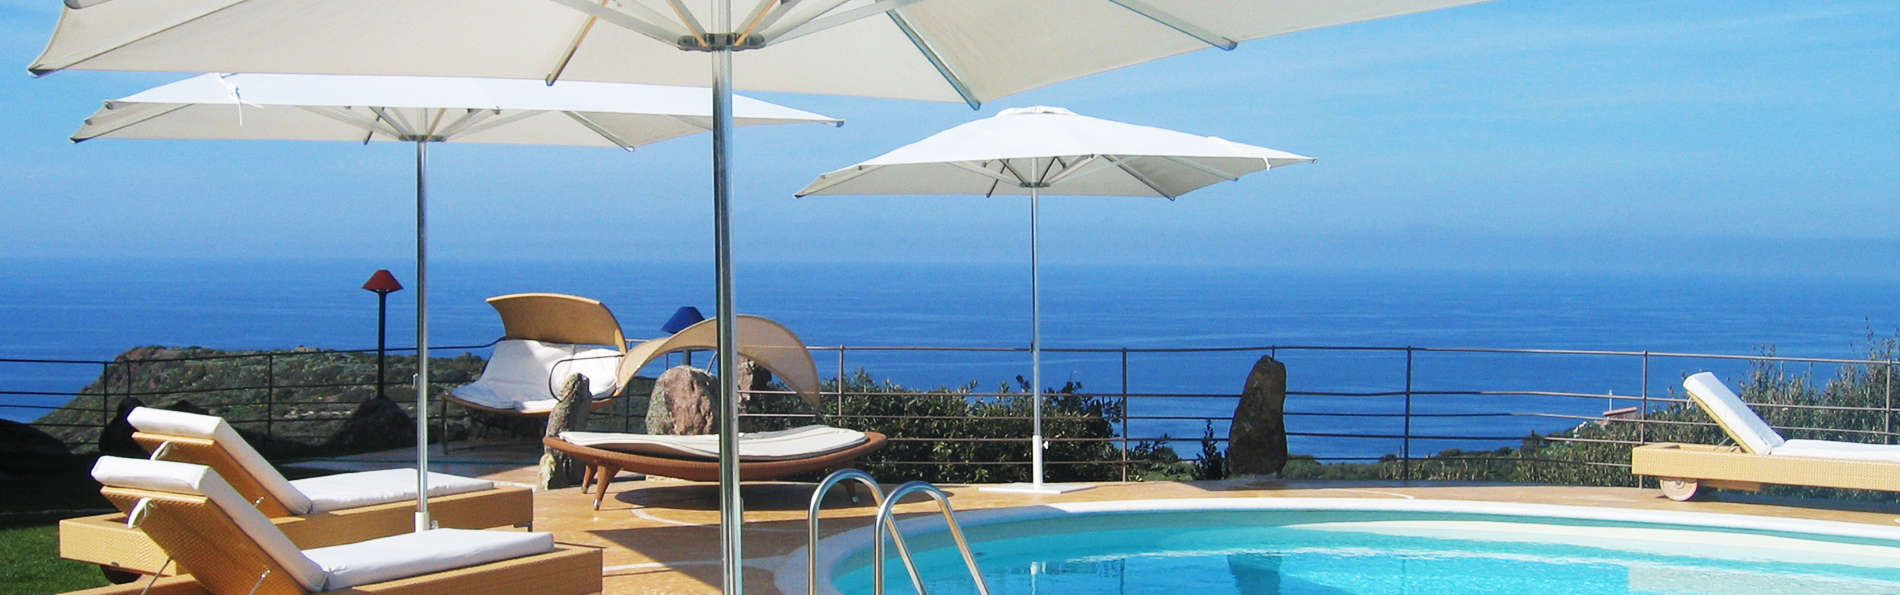 Bajaloglia Resort - edit_pool2.jpg